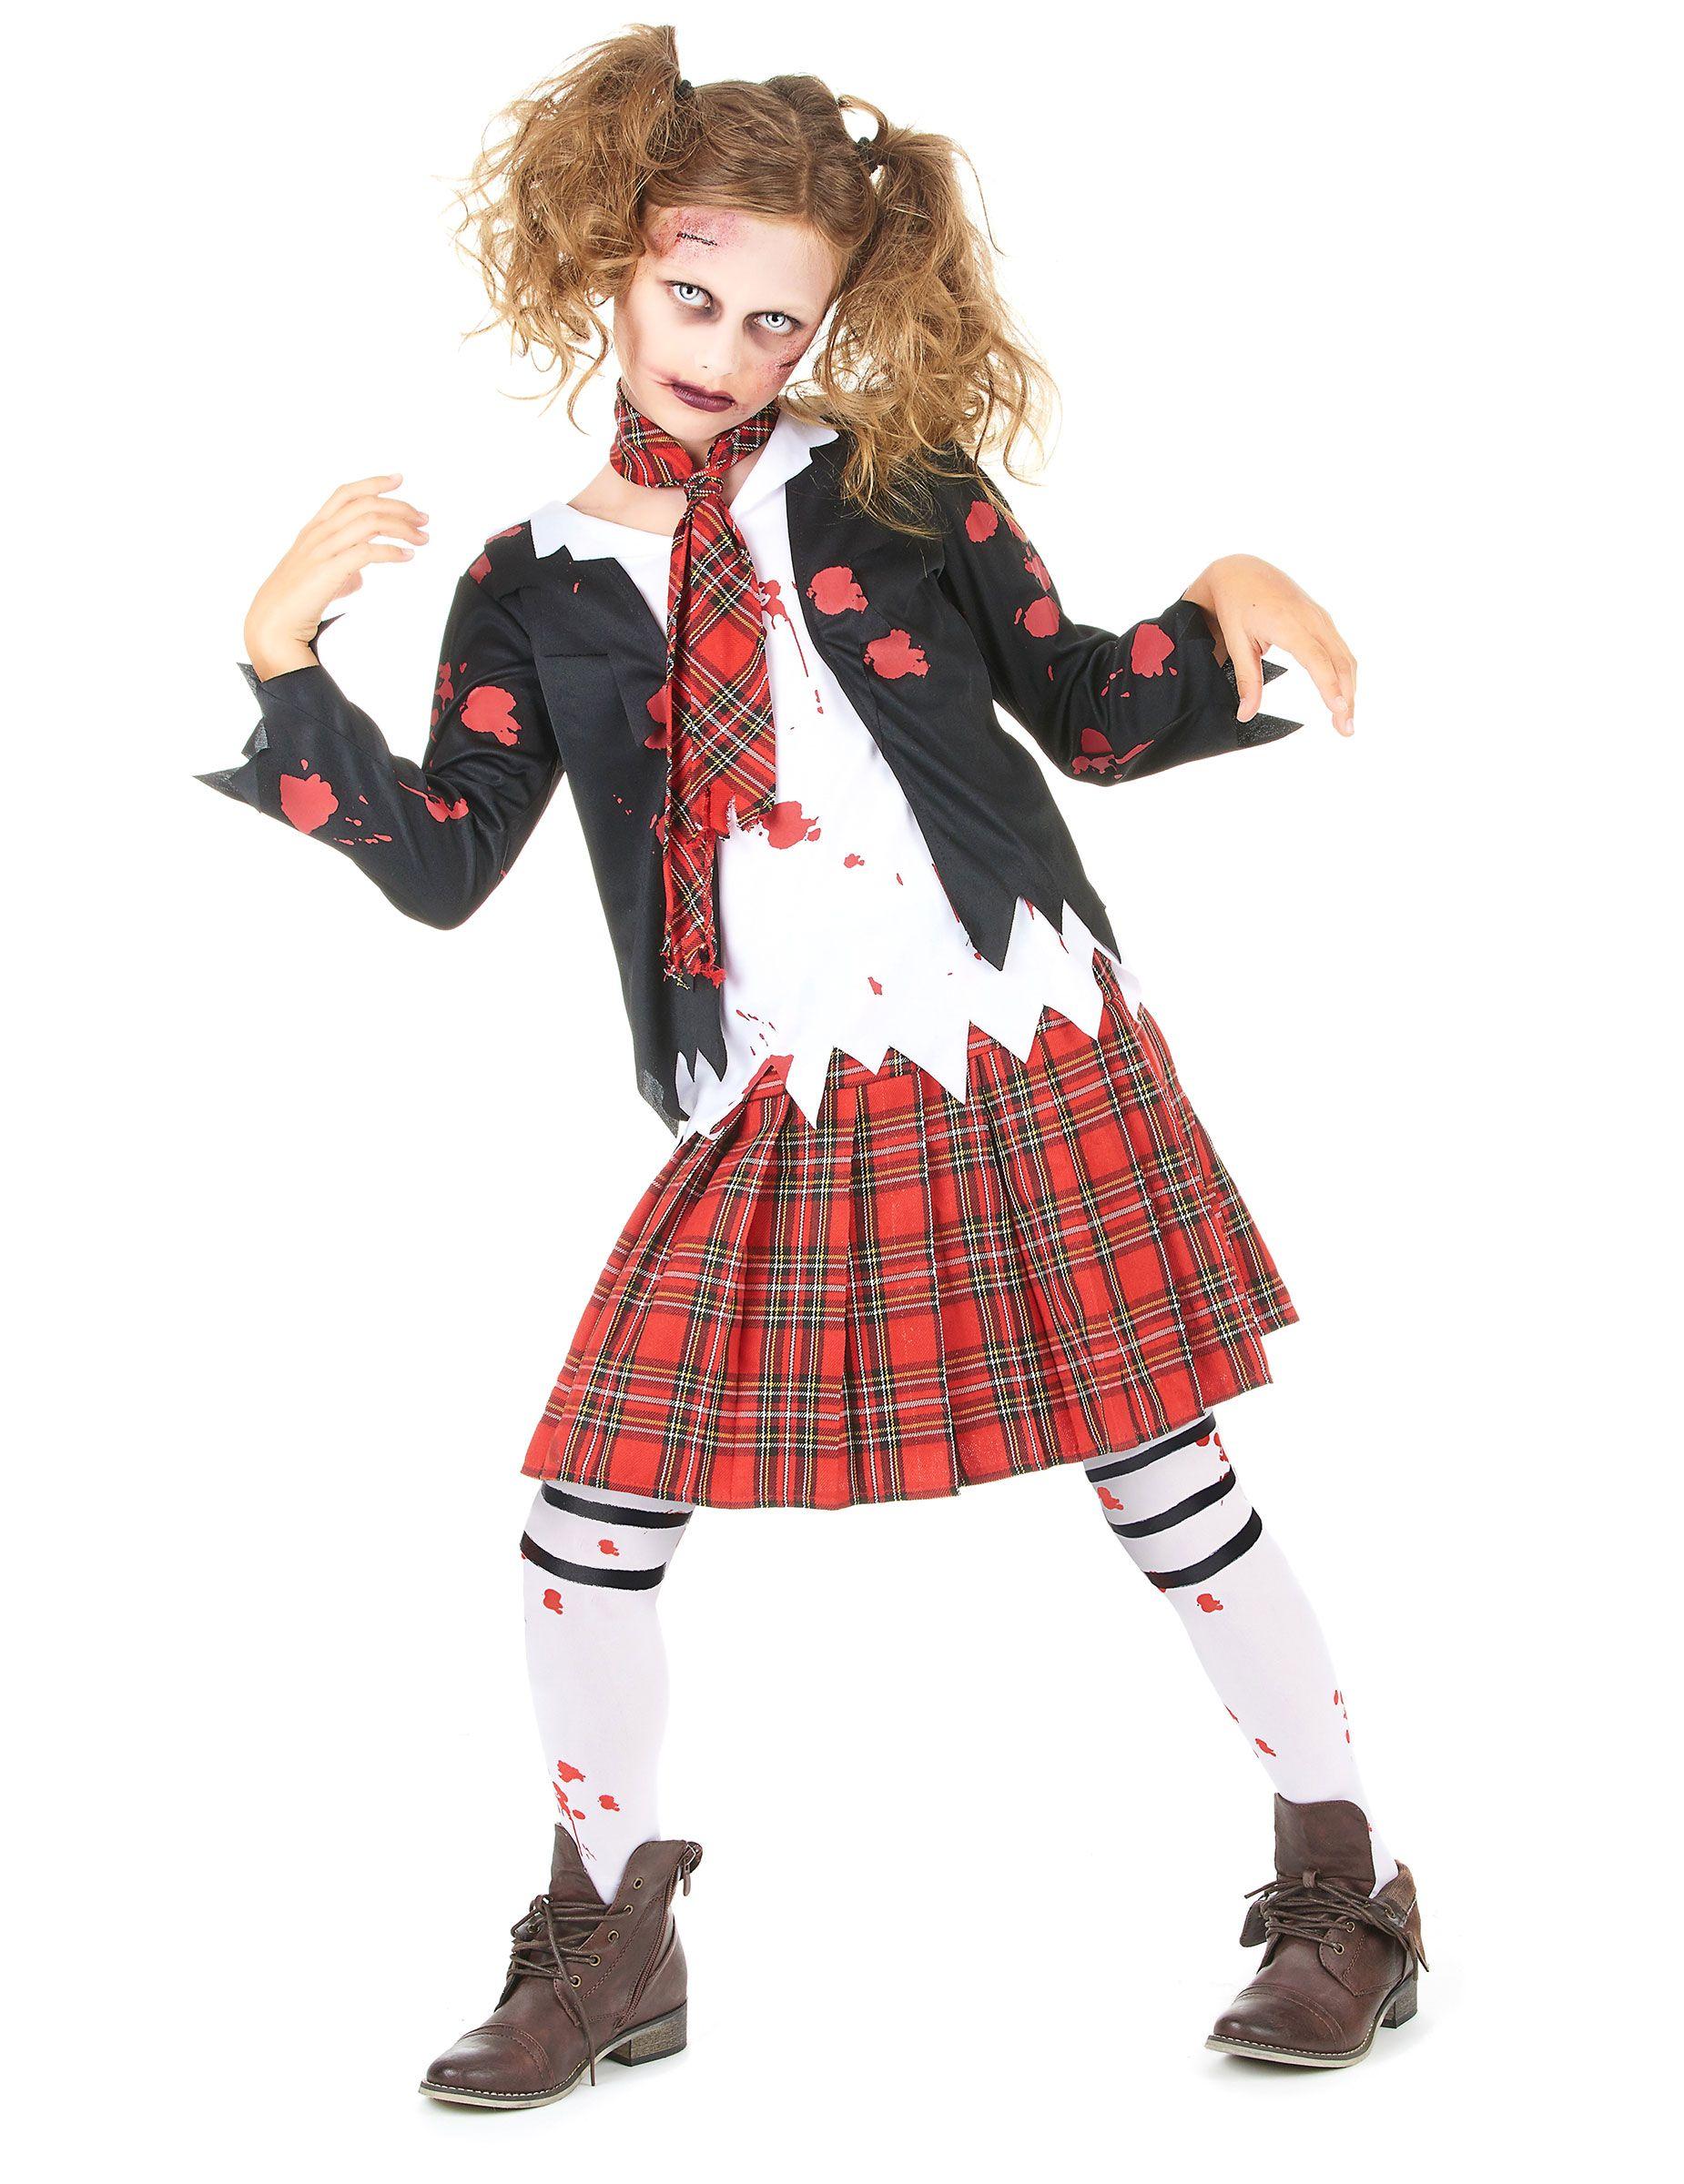 Quatang Gallery- Deguisement Ecoliere Zombie Fille Halloween Deguise Toi Achat De Deguisements Enfants Deguisement Ecoliere Costume Halloween Deguisement Enfant Halloween